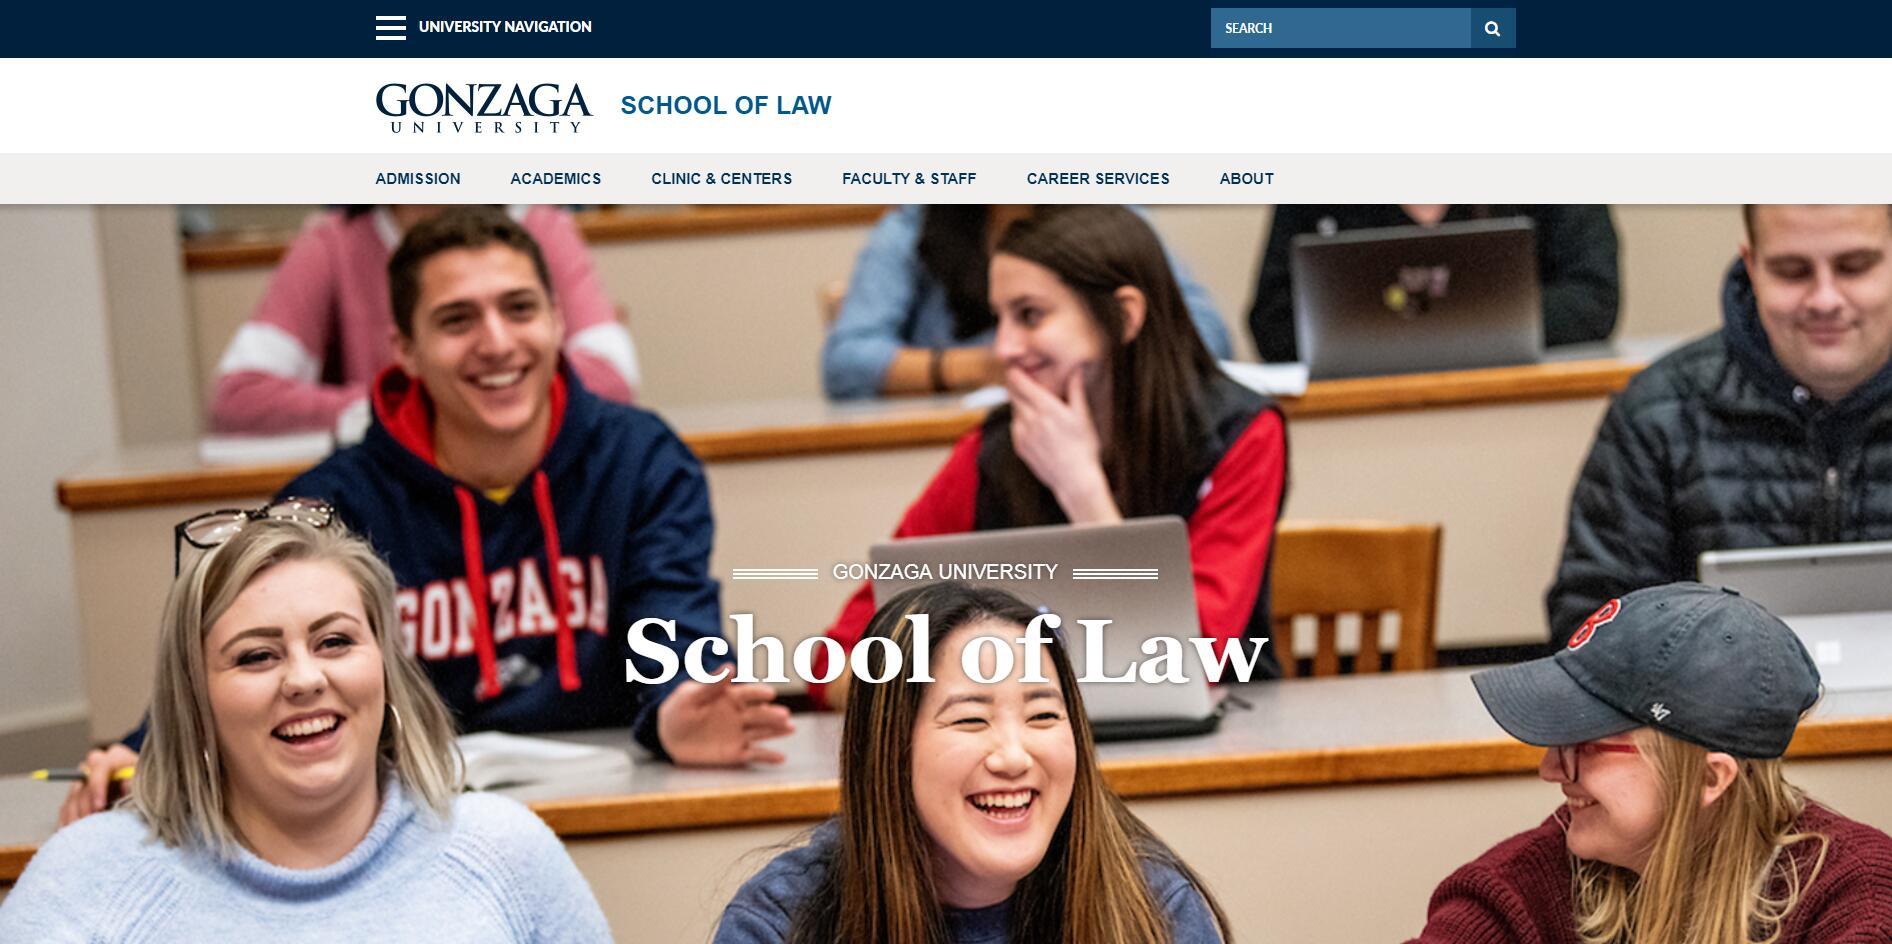 The School of Law at Gonzaga University